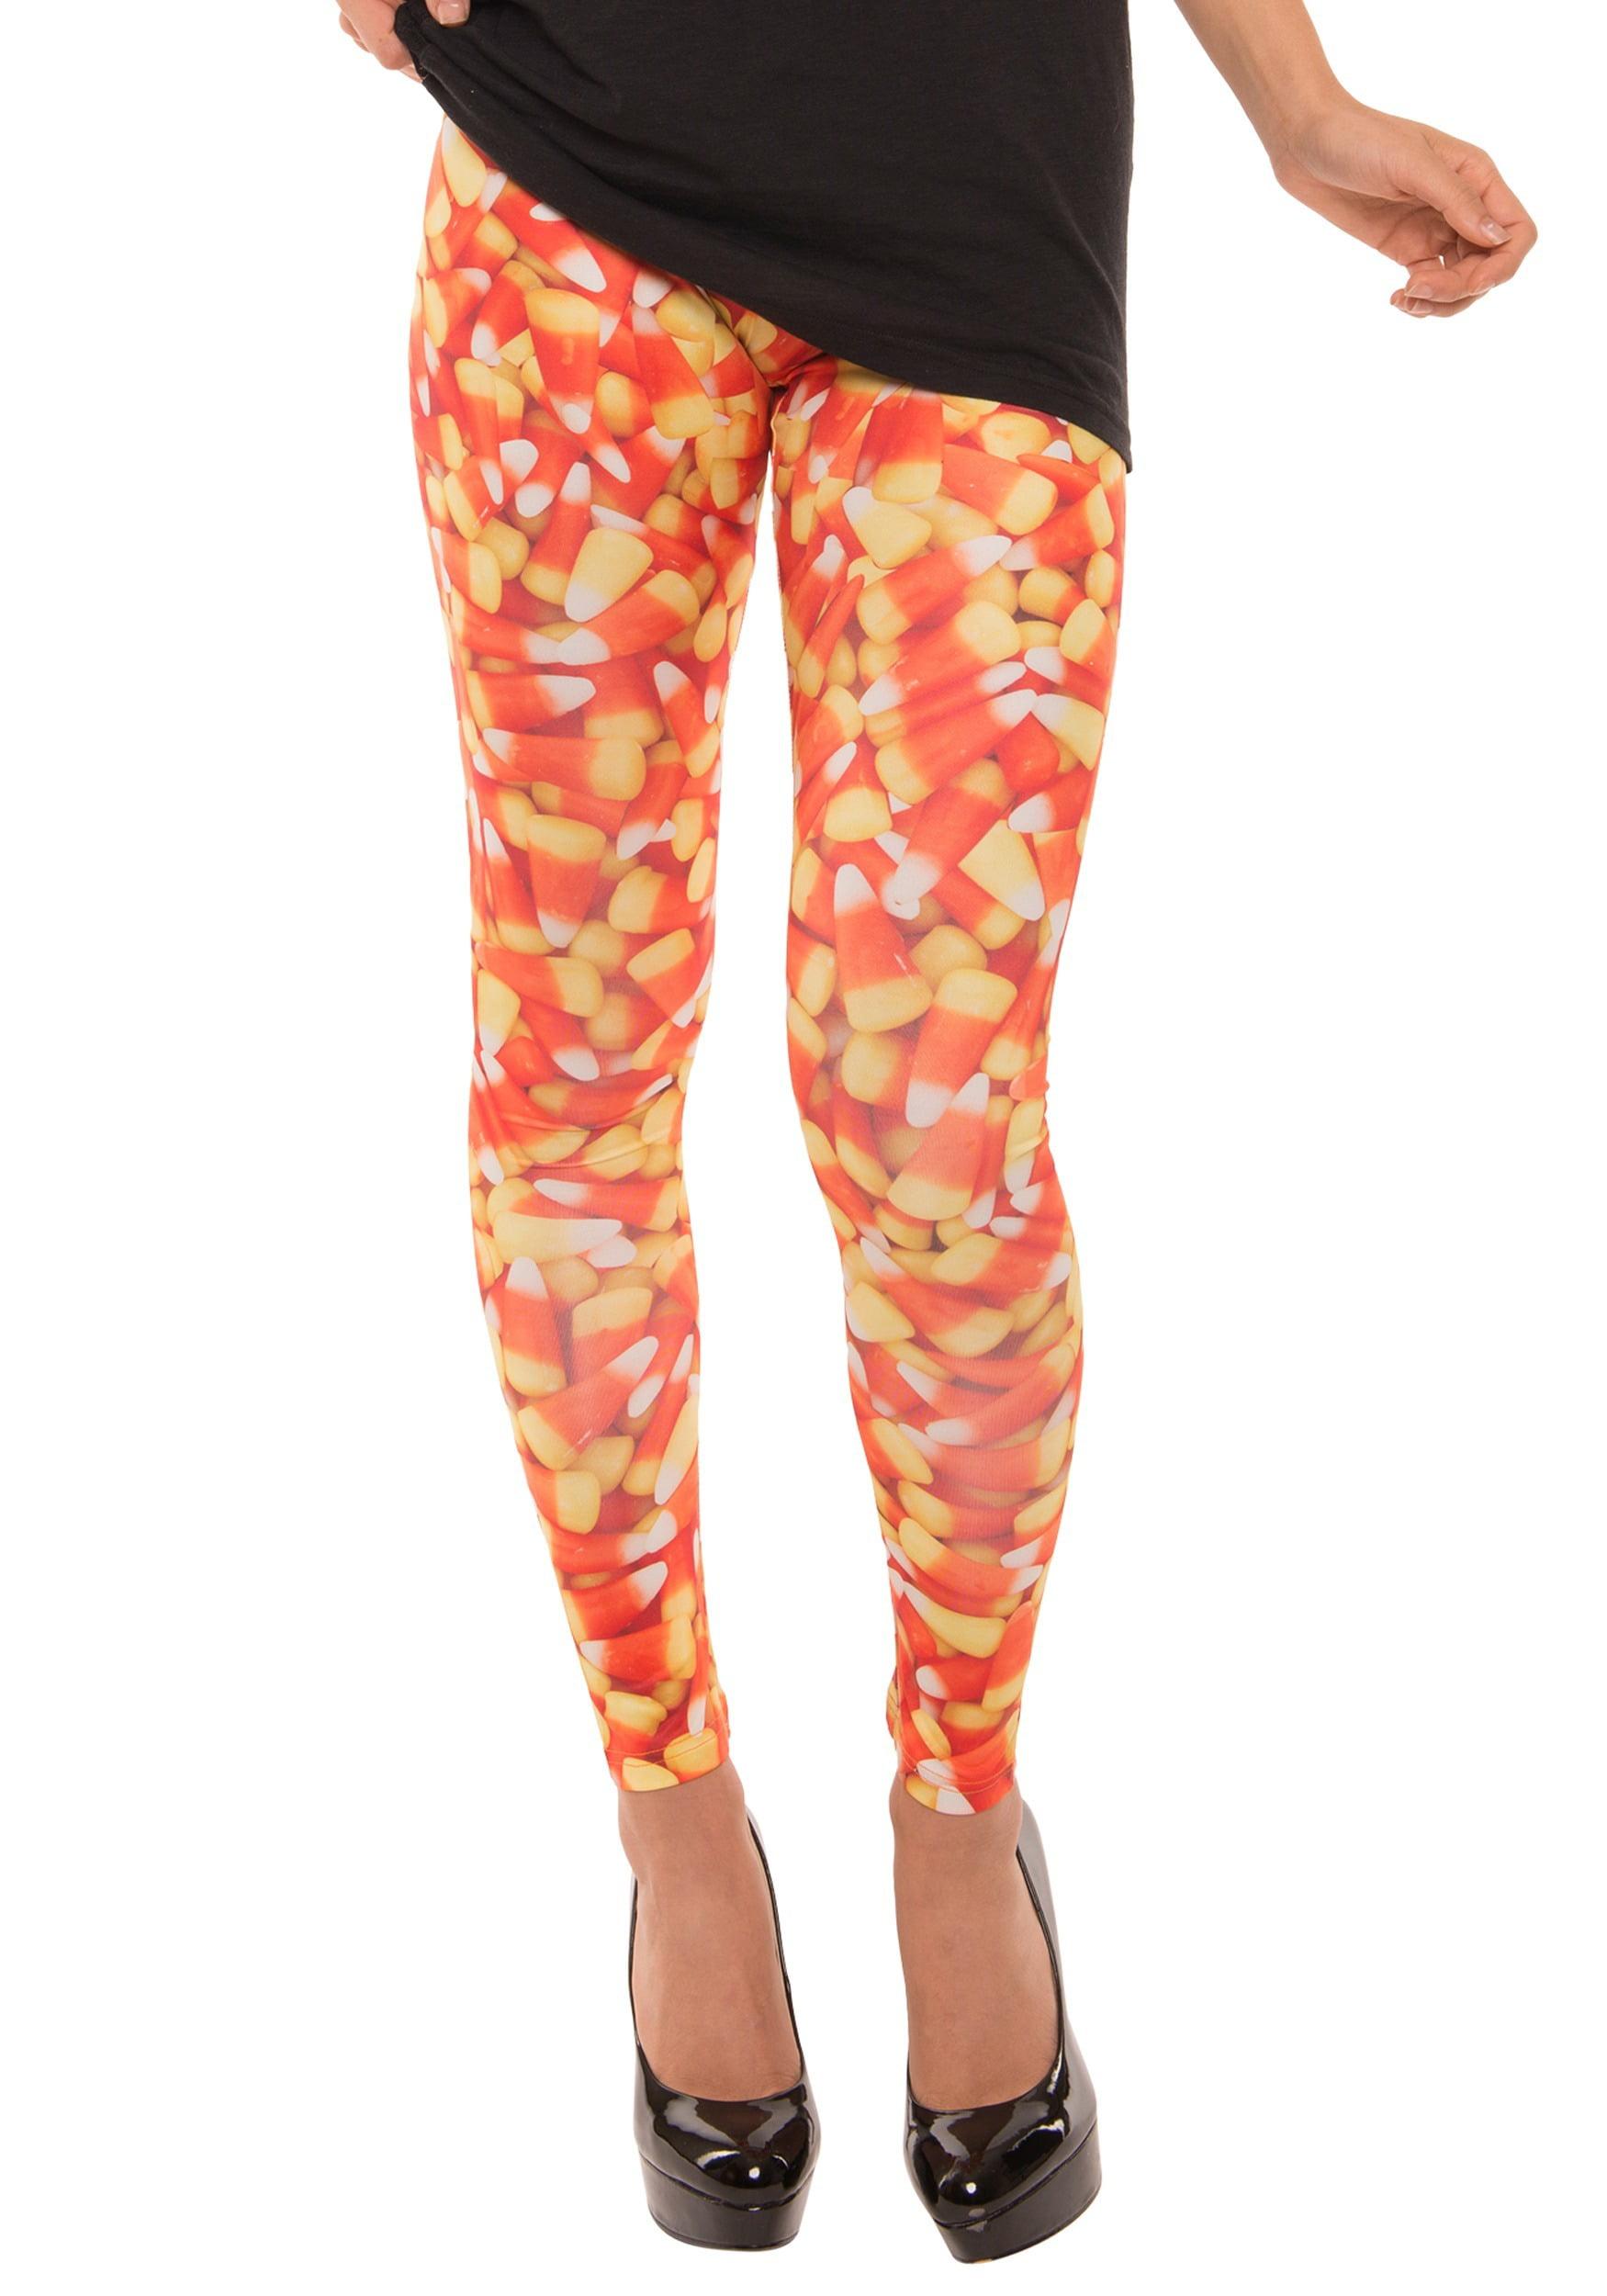 Womens Candy Corn Leggings